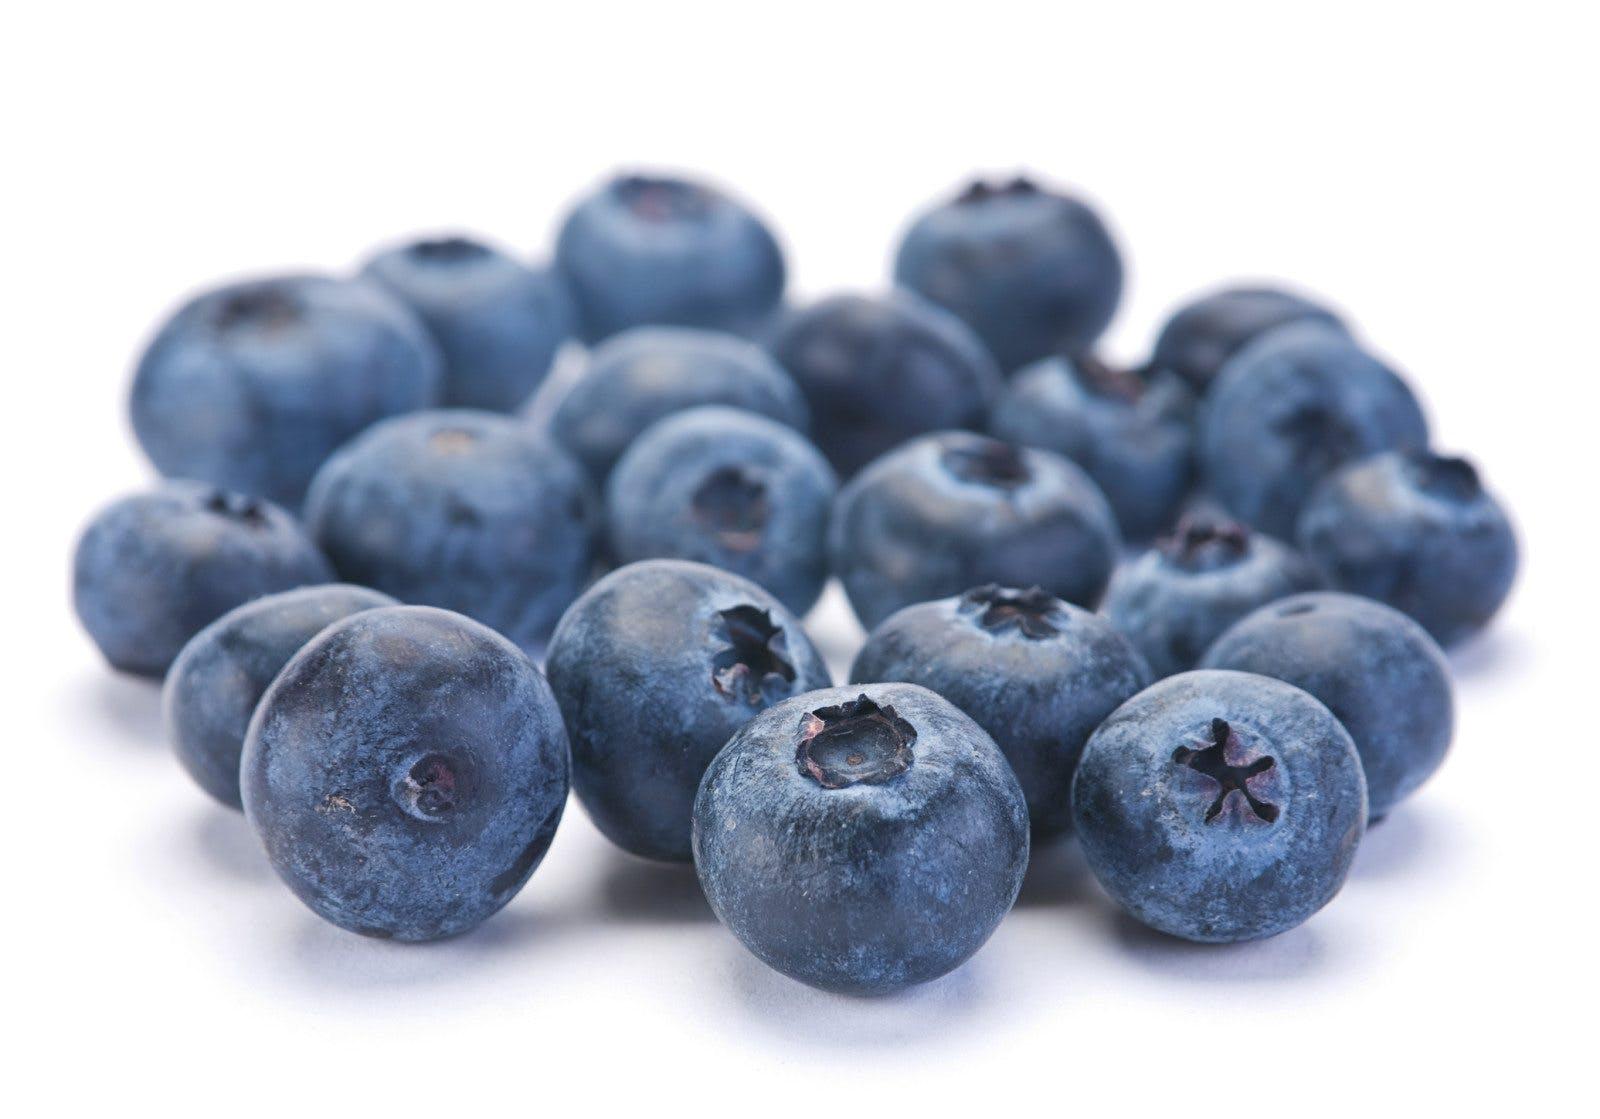 2014-09-30-Blueberries